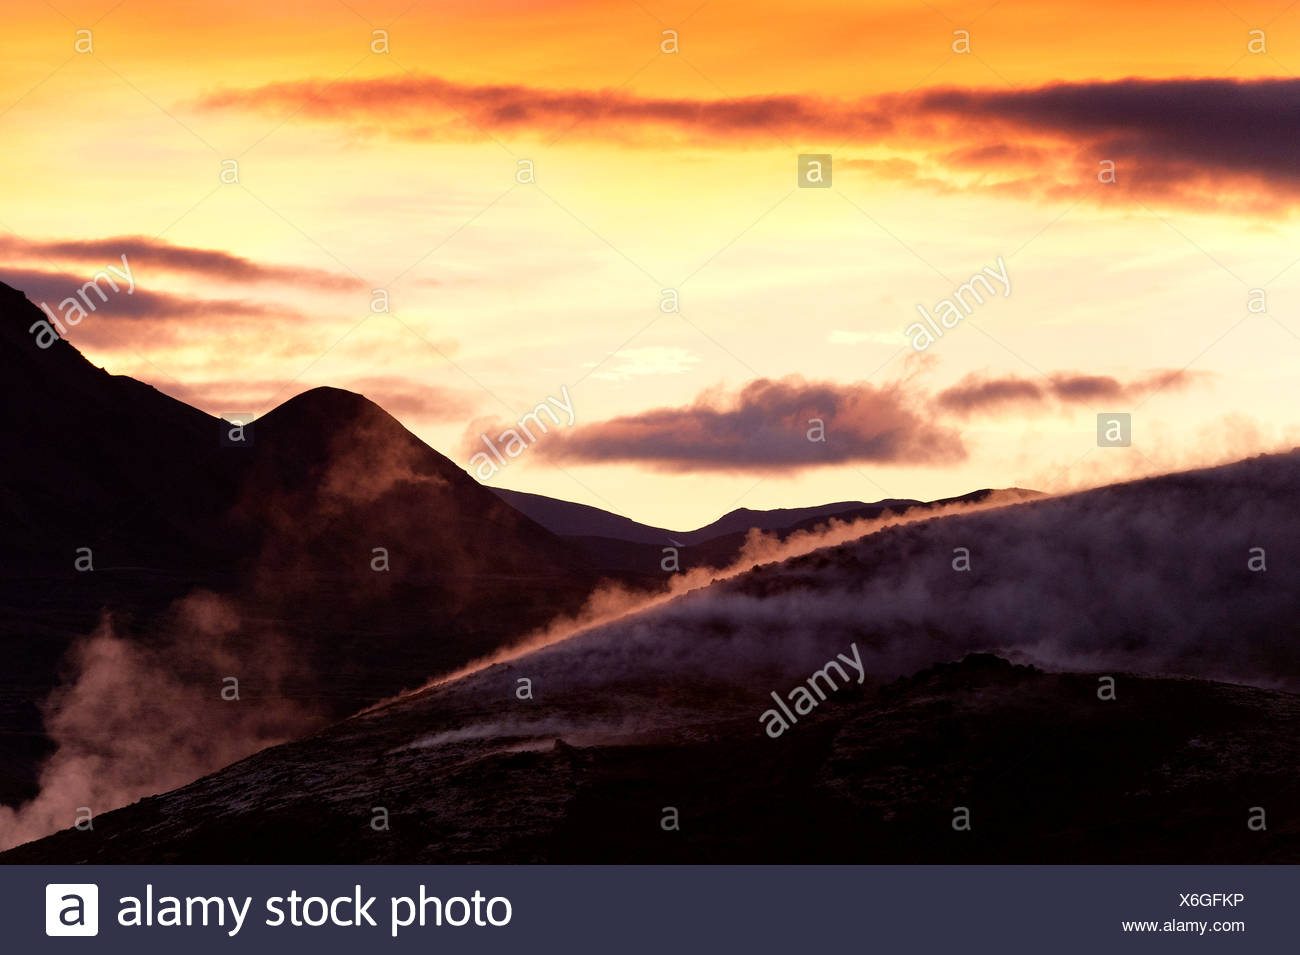 Rising steam, geothermal energy, near Lake Myvatn, northern Iceland, Europe - Stock Image